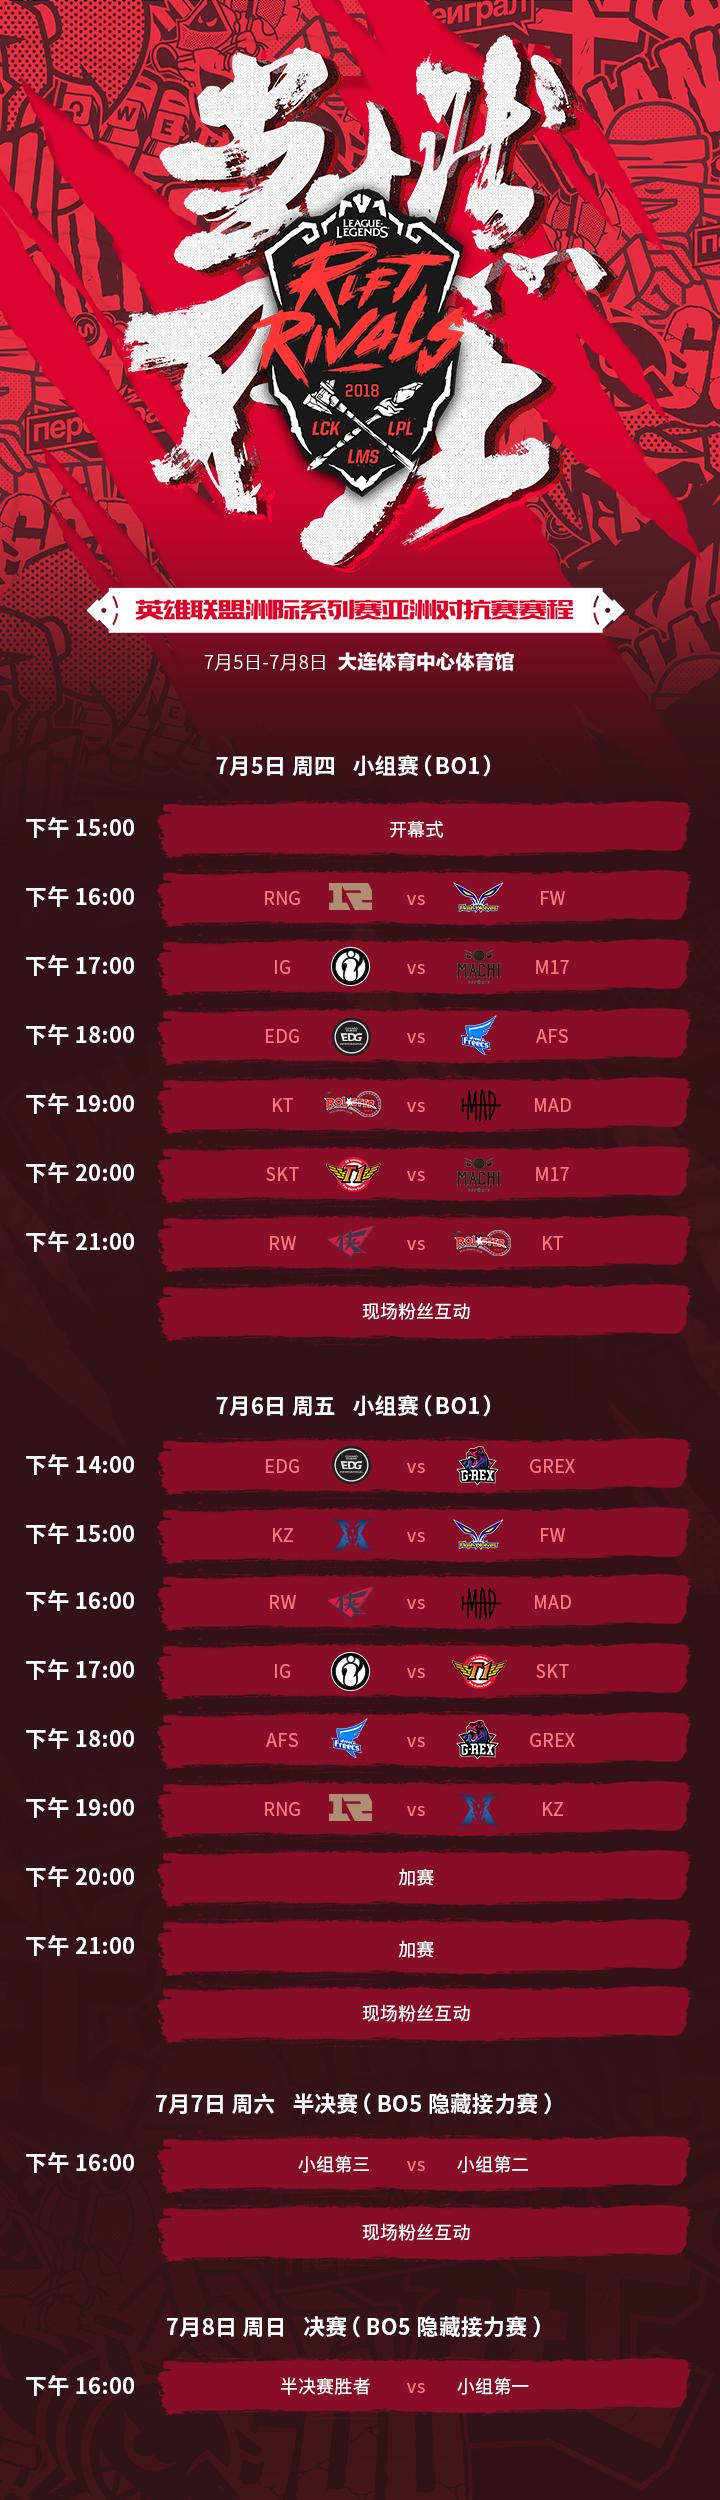 lol2018洲际赛赛程公布:7月5日首战RNG对阵FW